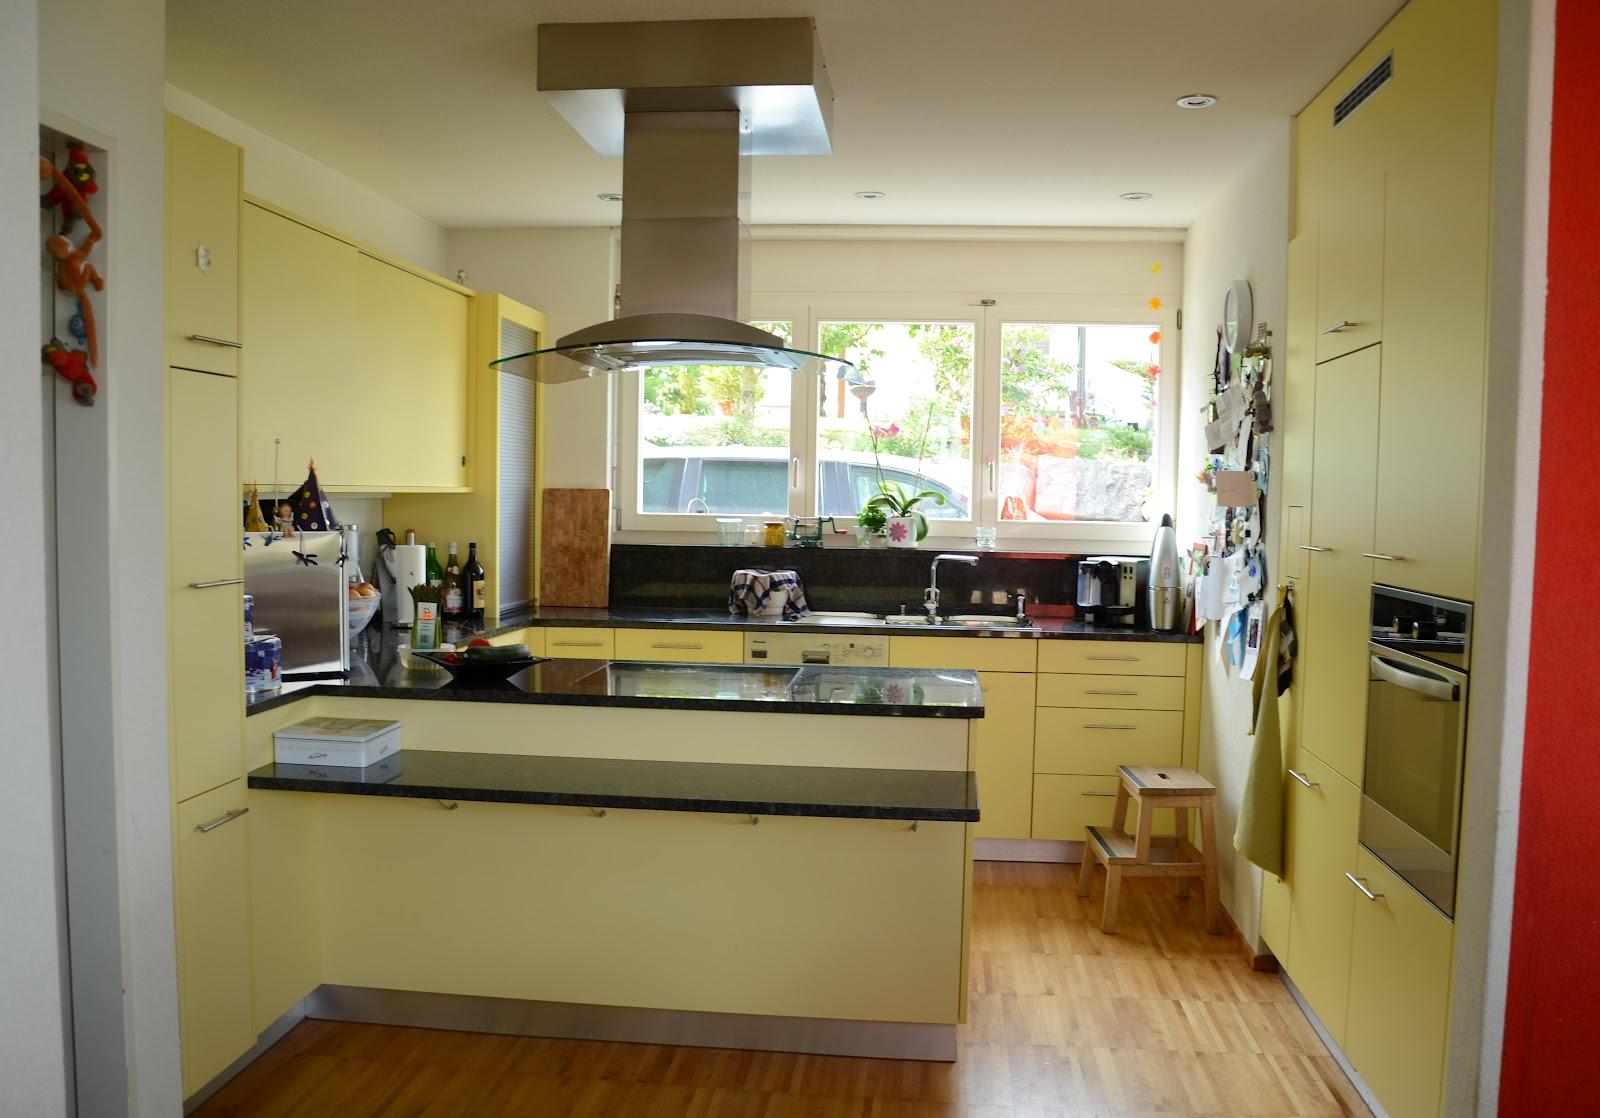 widmatt tag der offenen k chen die widmatt k che. Black Bedroom Furniture Sets. Home Design Ideas